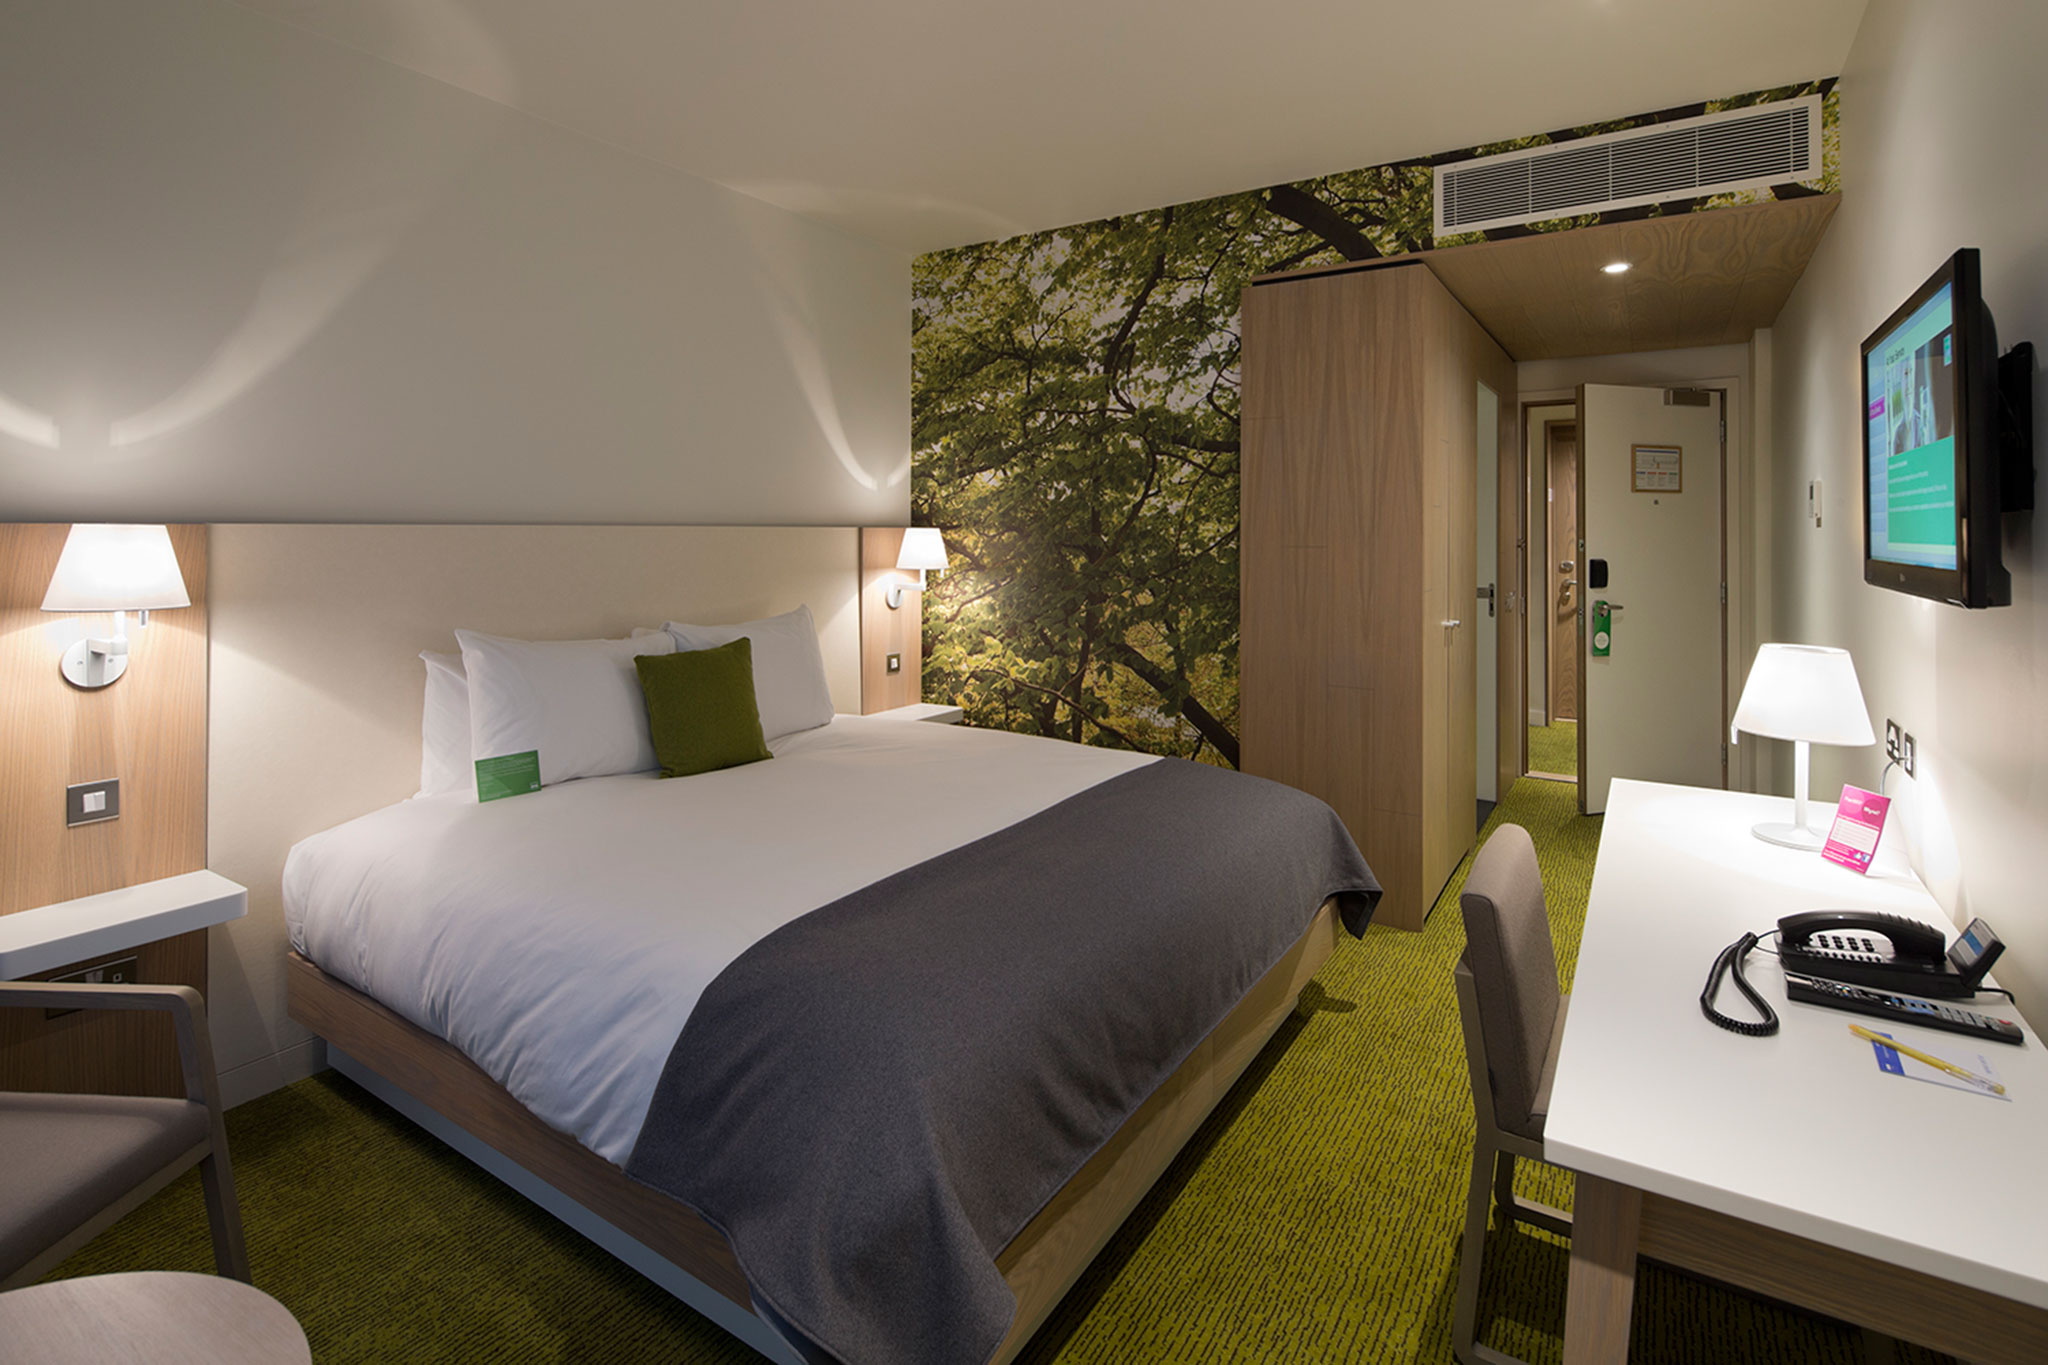 Interior design courses nottingham for Hotel design course